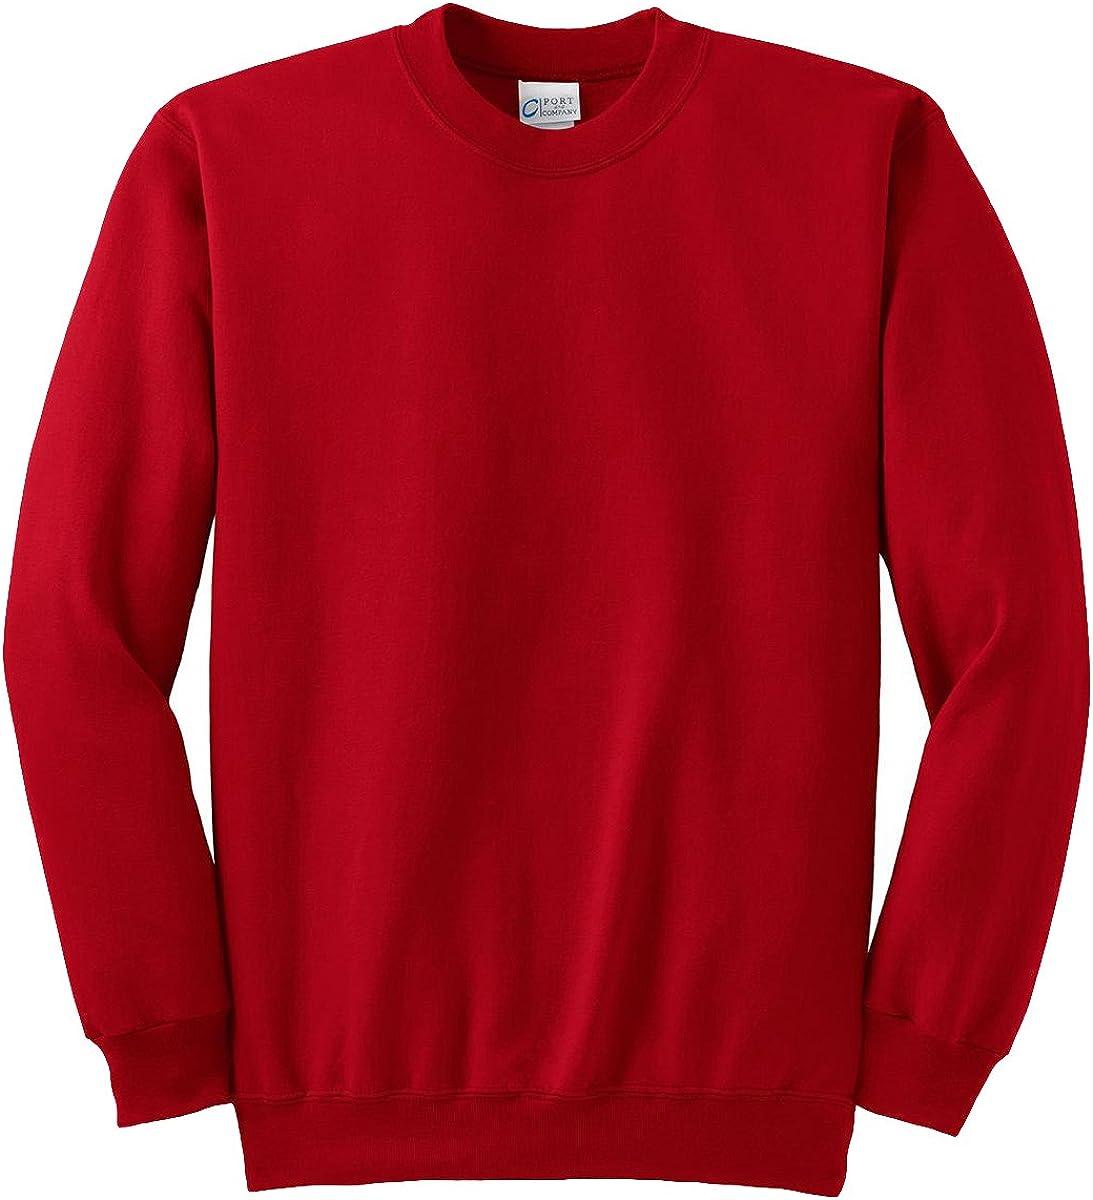 Port & Company Tall Ultimate Crewneck Sweatshirt>4XLT Red PC90T